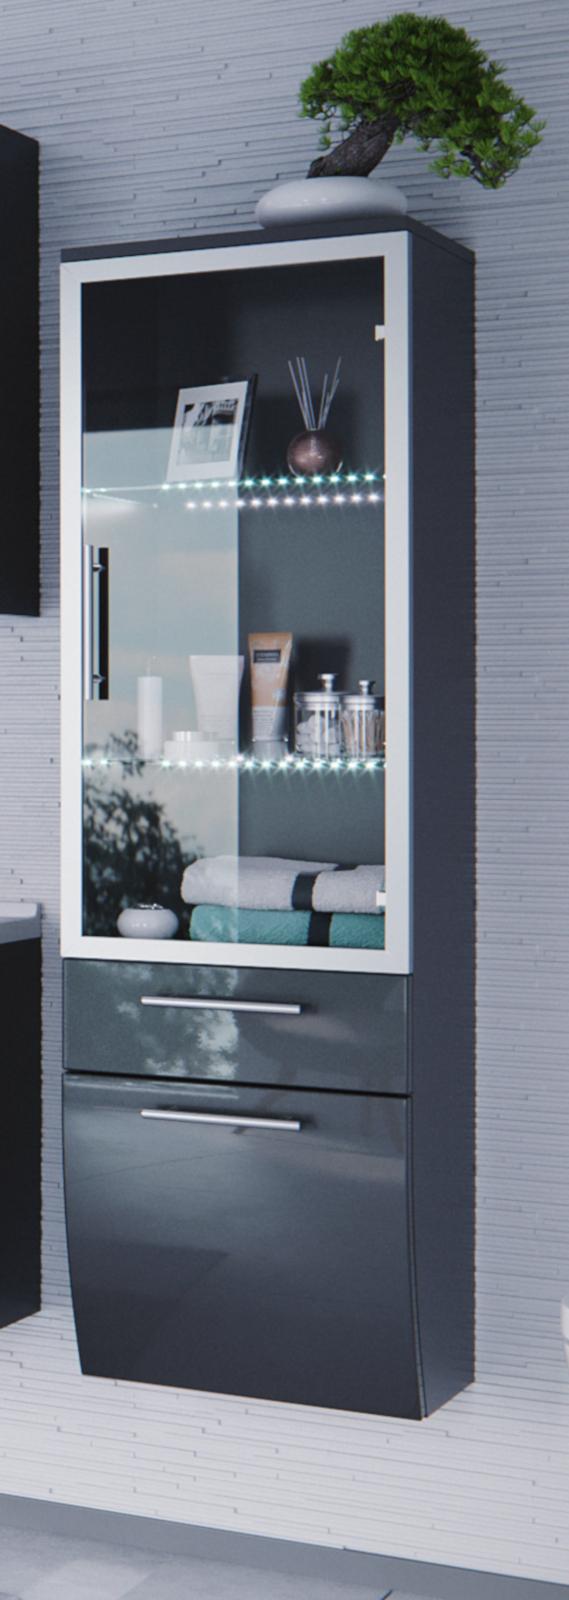 badm bel hochschrank salona in anthrazit. Black Bedroom Furniture Sets. Home Design Ideas